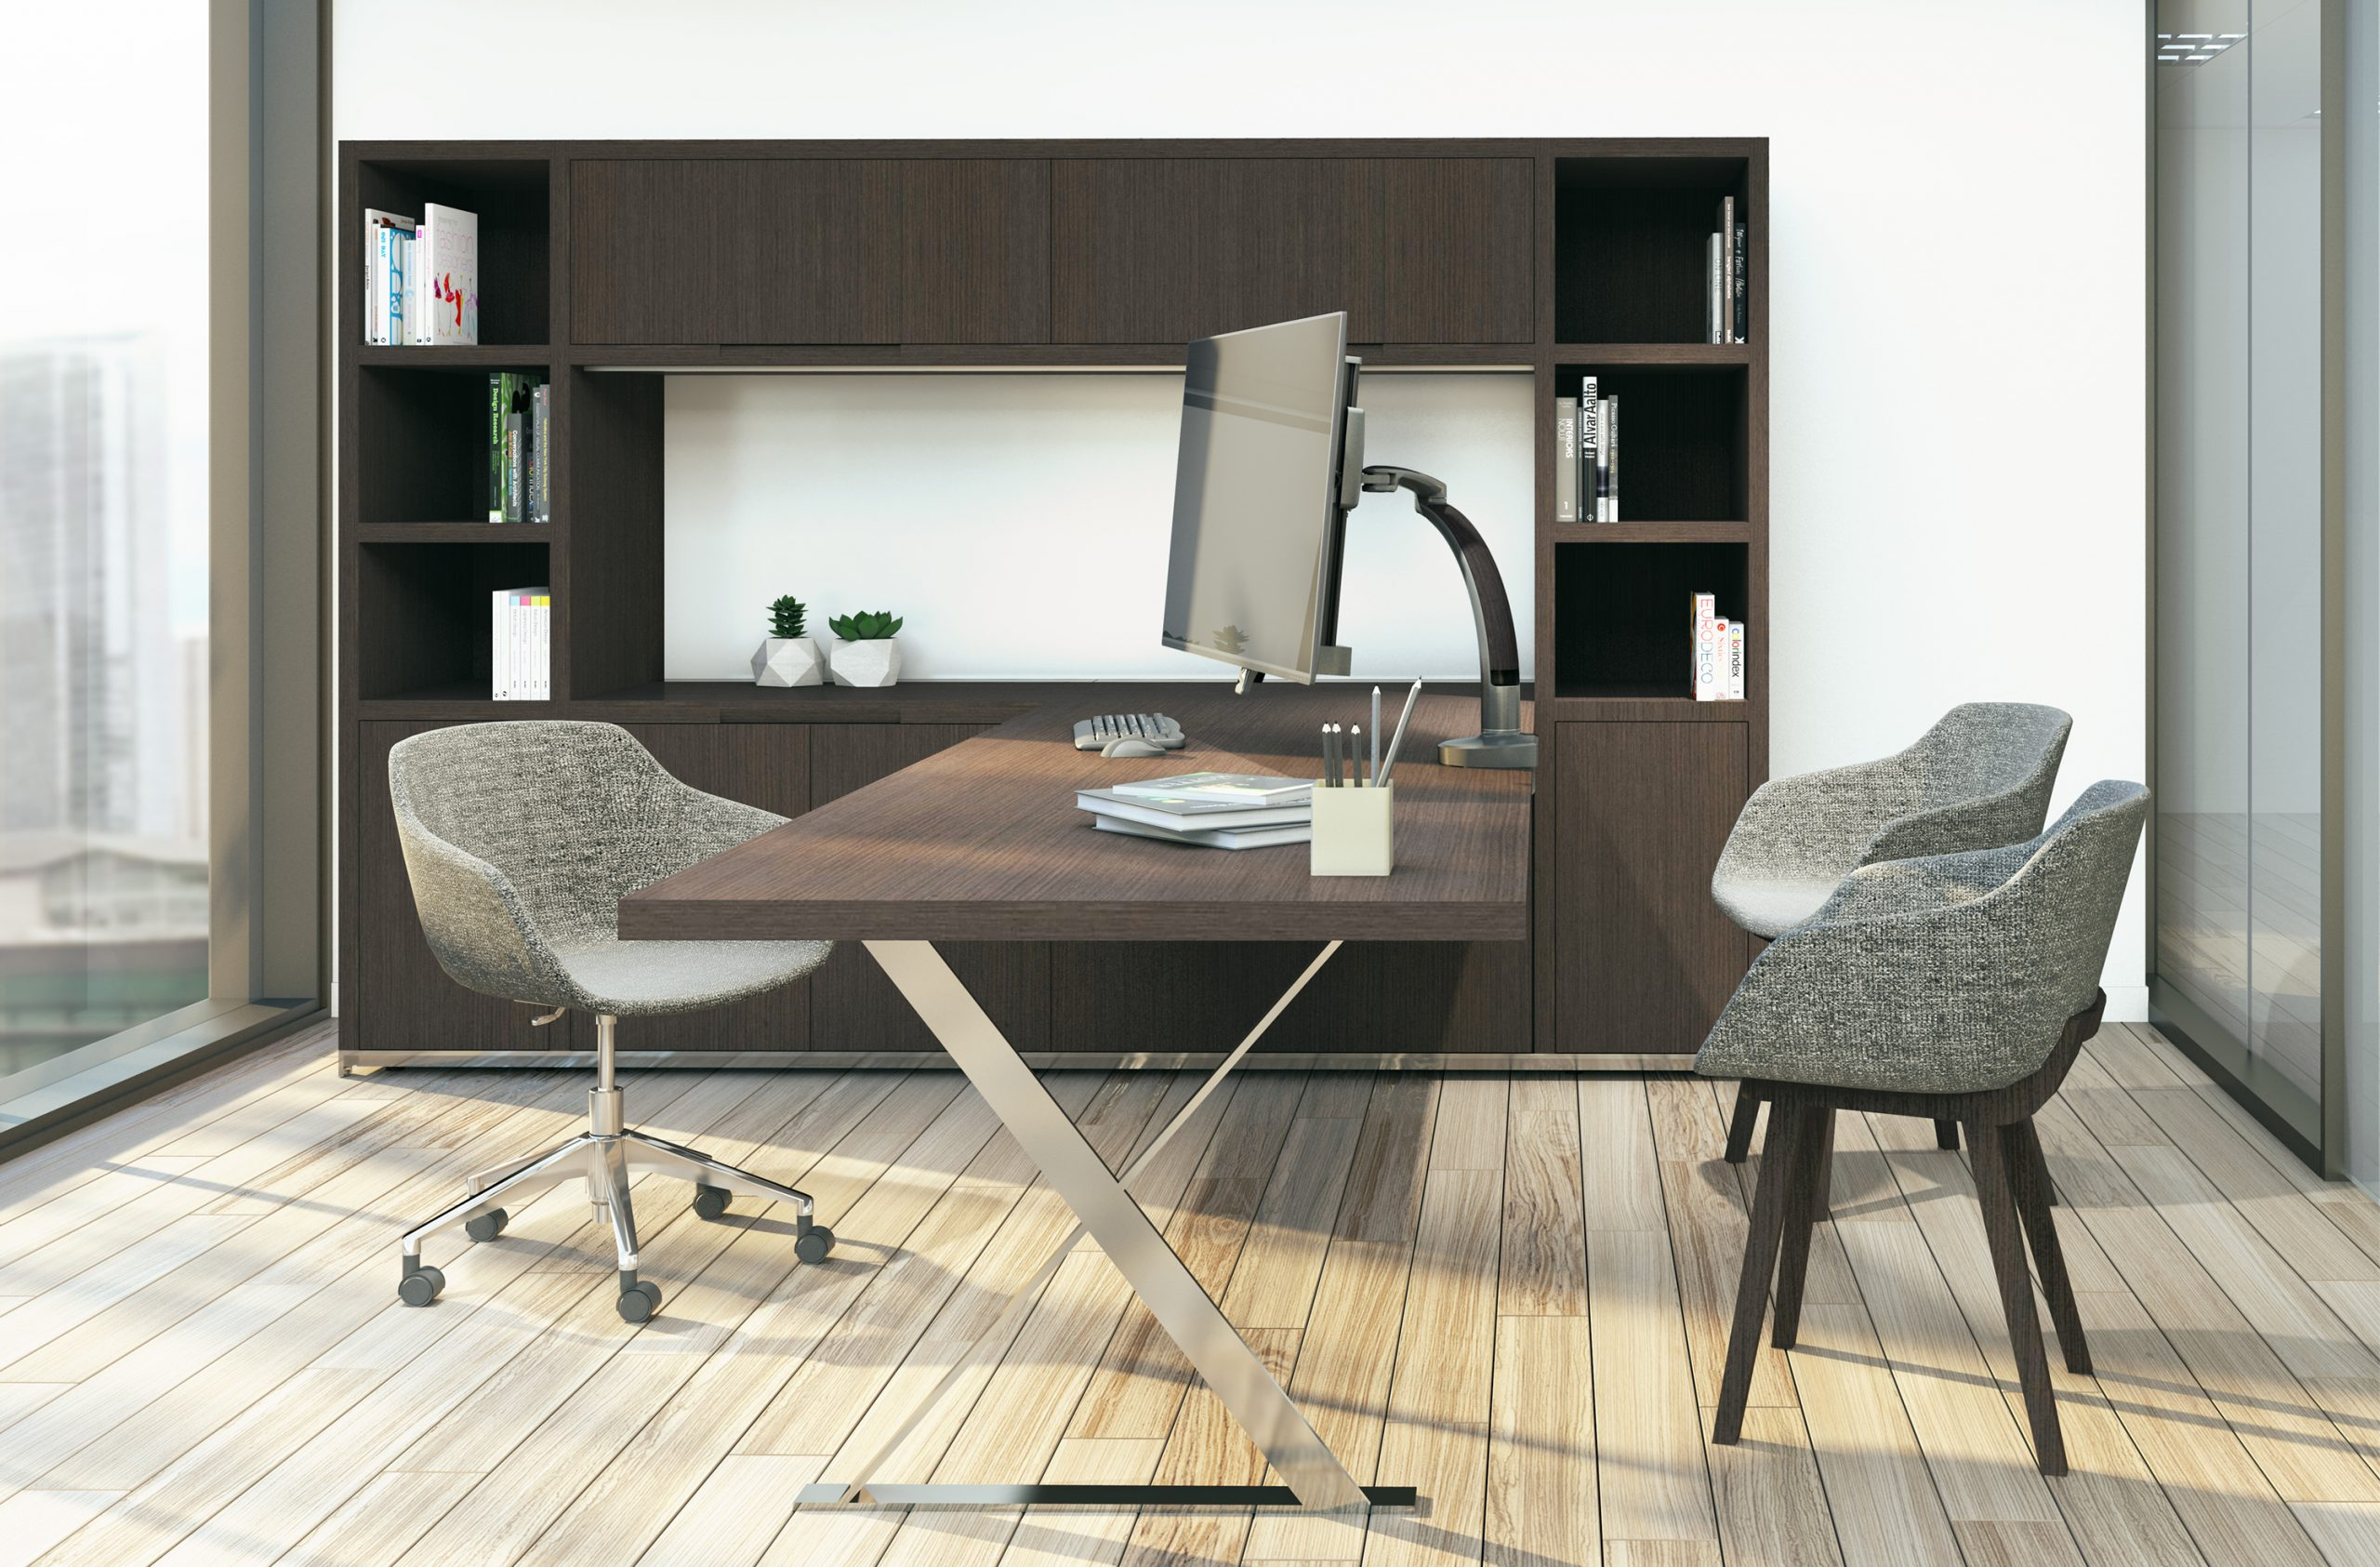 "Ella lifestyle traditional office scaled <ul> <li>Screen size up to: 43""</li> <li>Available in Flat White, Silver, Vista Black</li> <li>Height adjustment: 11.5"" | Extension range 24.4""</li> <li>Pivot: Landscape / Portrait</li> <li>Rotation: 180° at base, 360° at upper joints</li> <li>Mount Configurations: Desk Edge and Grommet</li> <li>Vesa Compatibility: 75 & 100mm, adapter included</li> <li>Warranty 10 Years</li> </ul>"